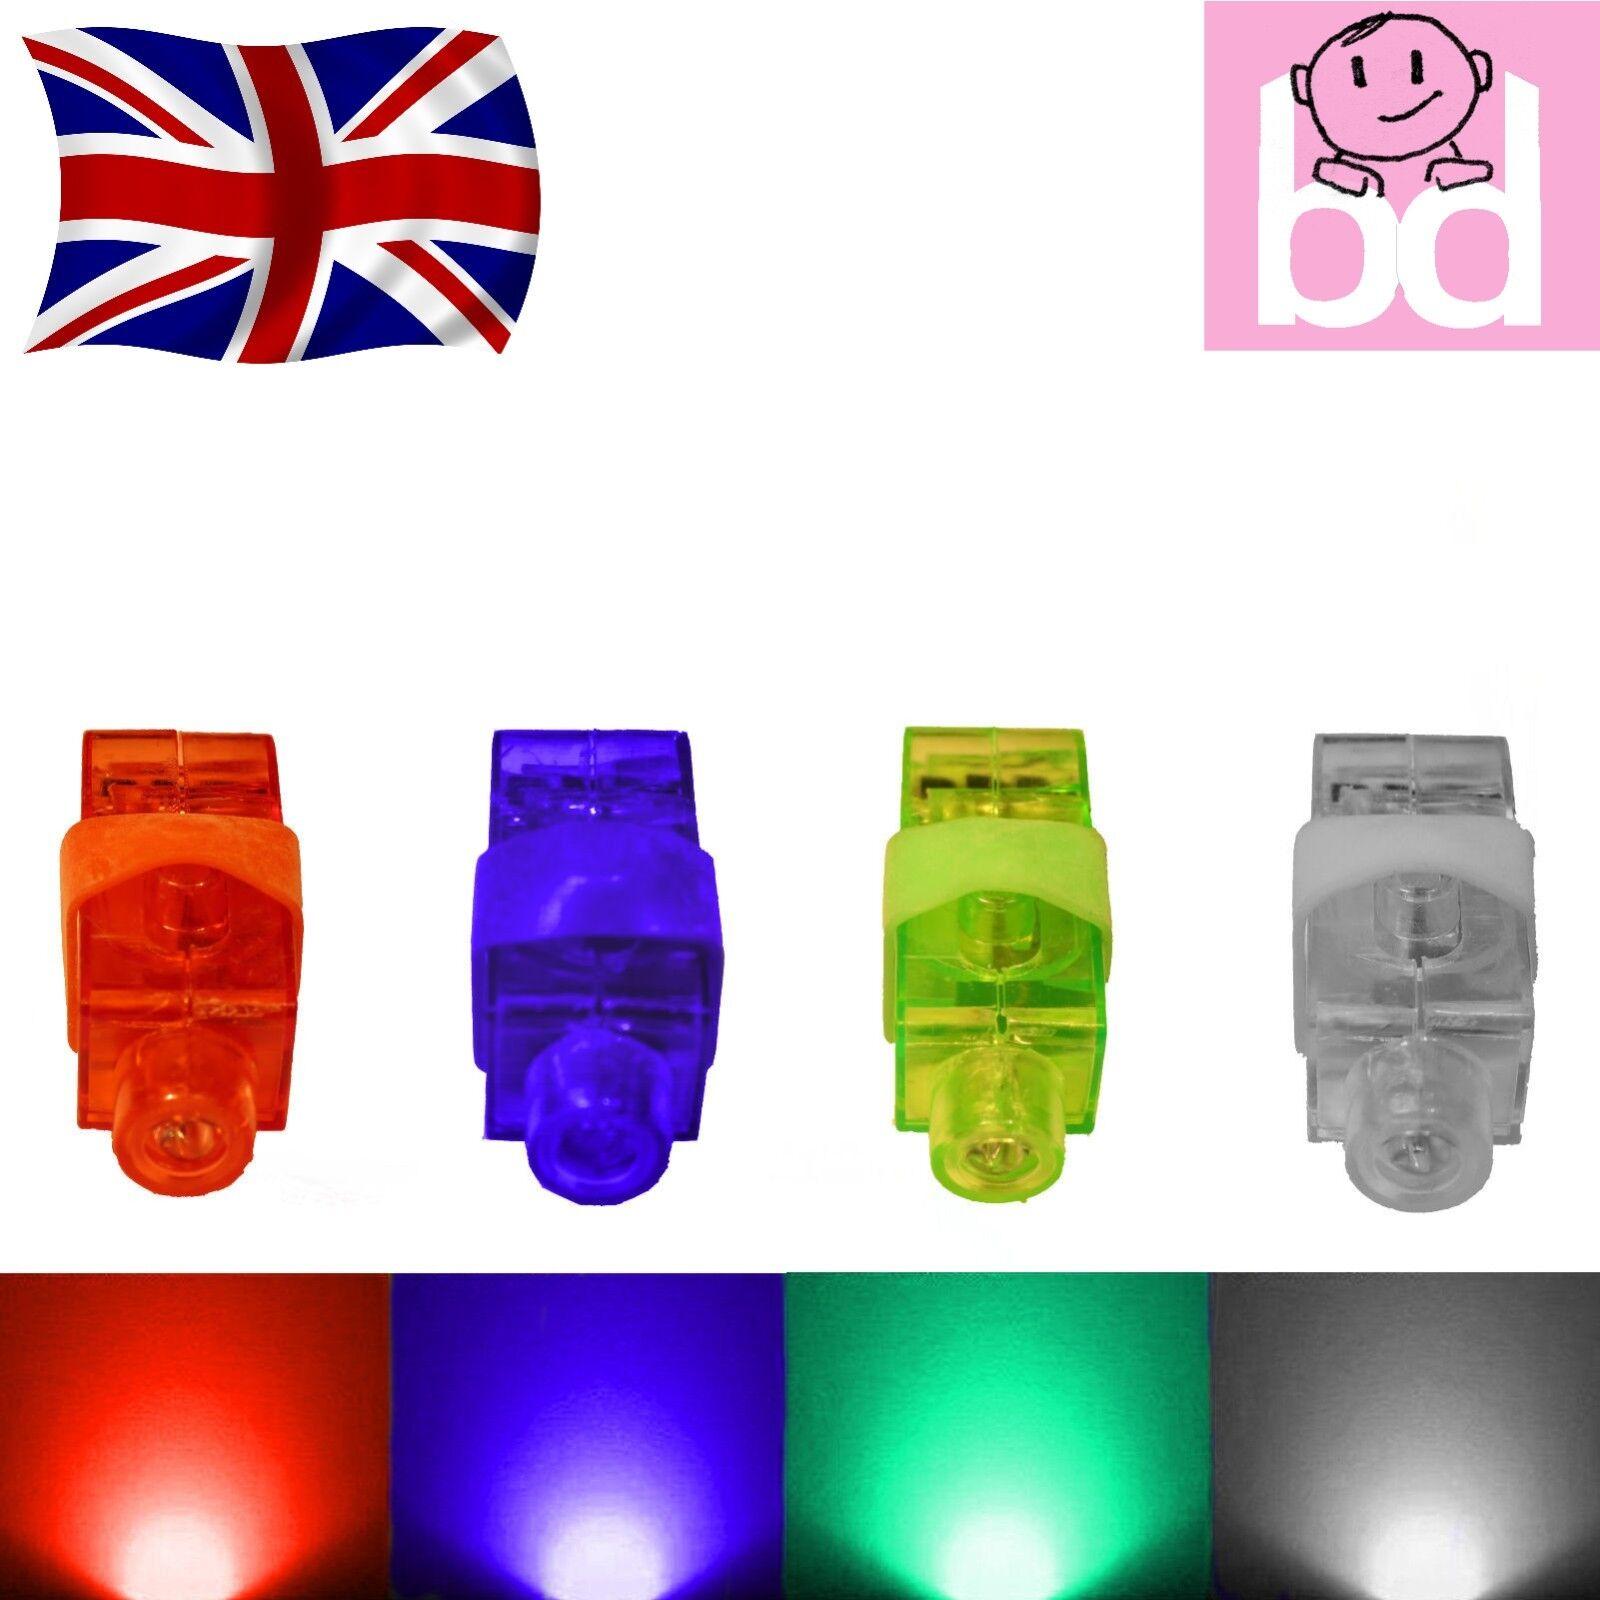 Super Bright Bright Super DEL Finger Lights Glow Ring Light Up Jouet Torche Party Disco Rave UK e647d9